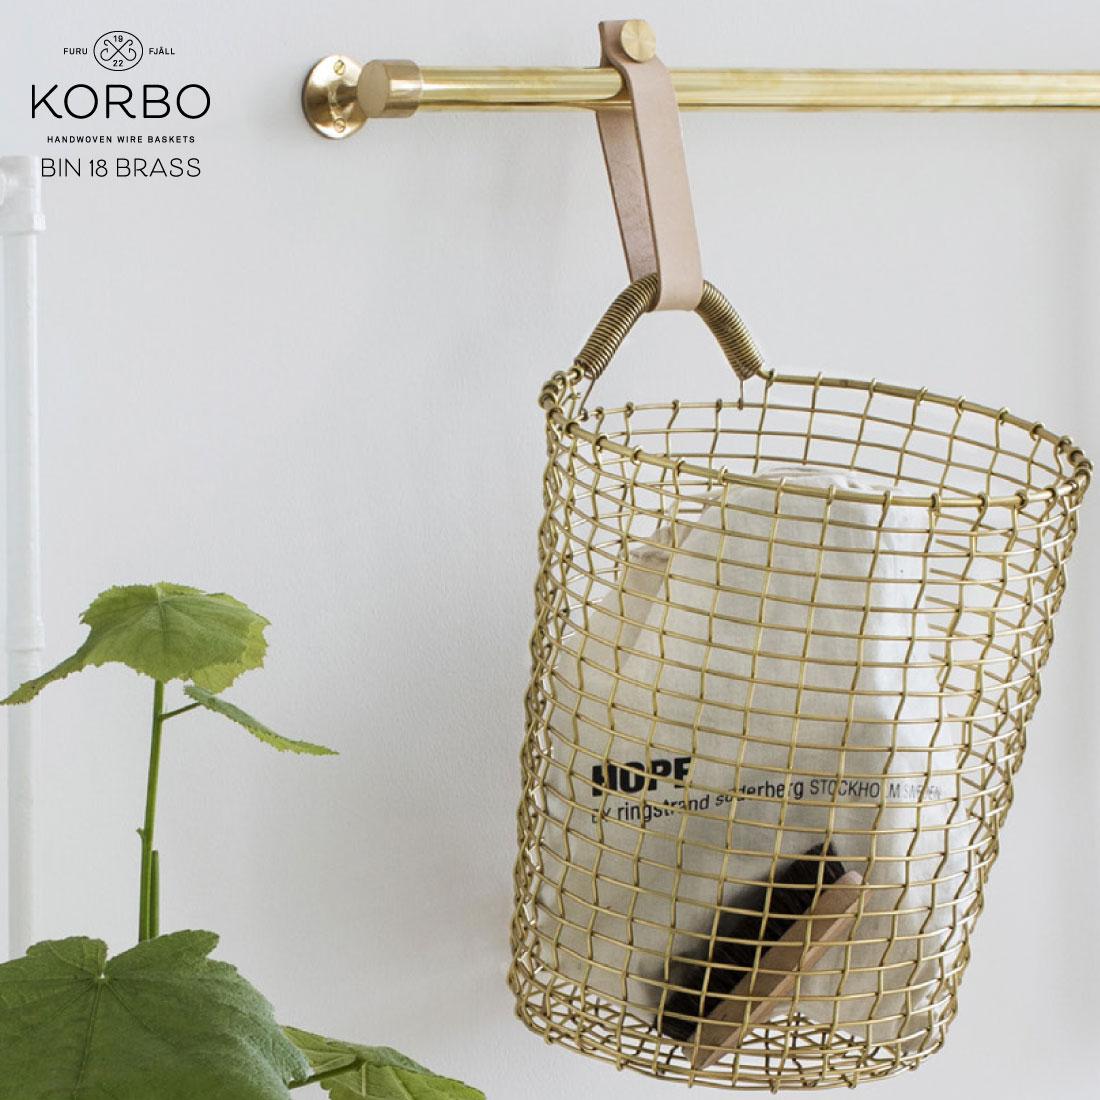 【KORBO/コルボ】BIN18ブラス/ワイヤーバスケット手織り/スウェーデン/北欧/カゴ/真鍮日本正規代理店品